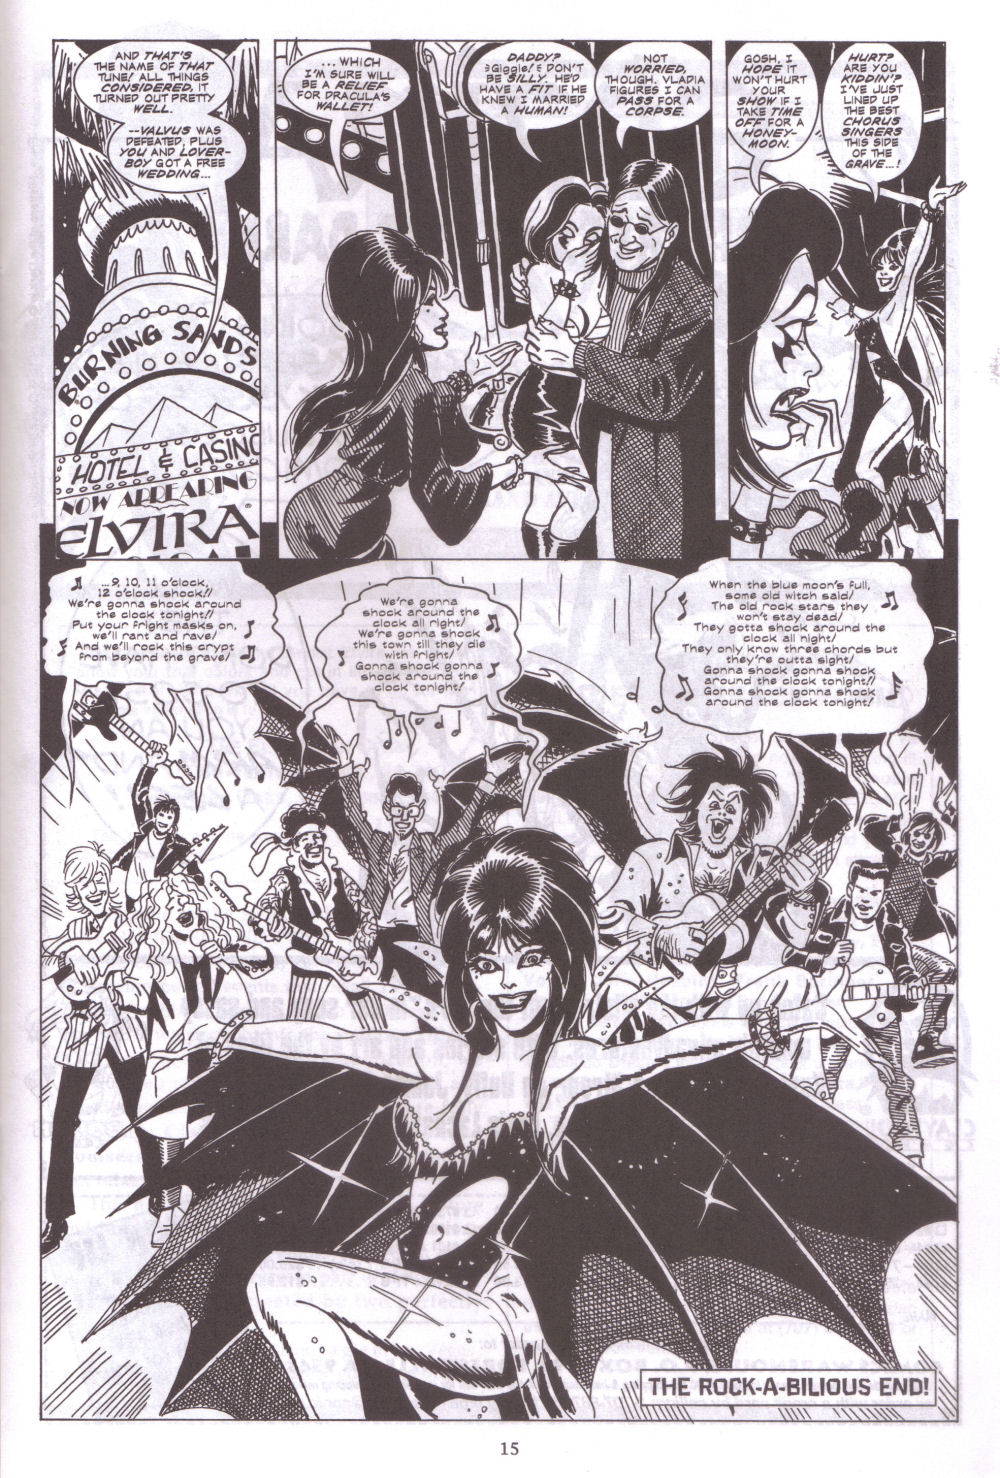 Read online Elvira, Mistress of the Dark comic -  Issue #127 - 17